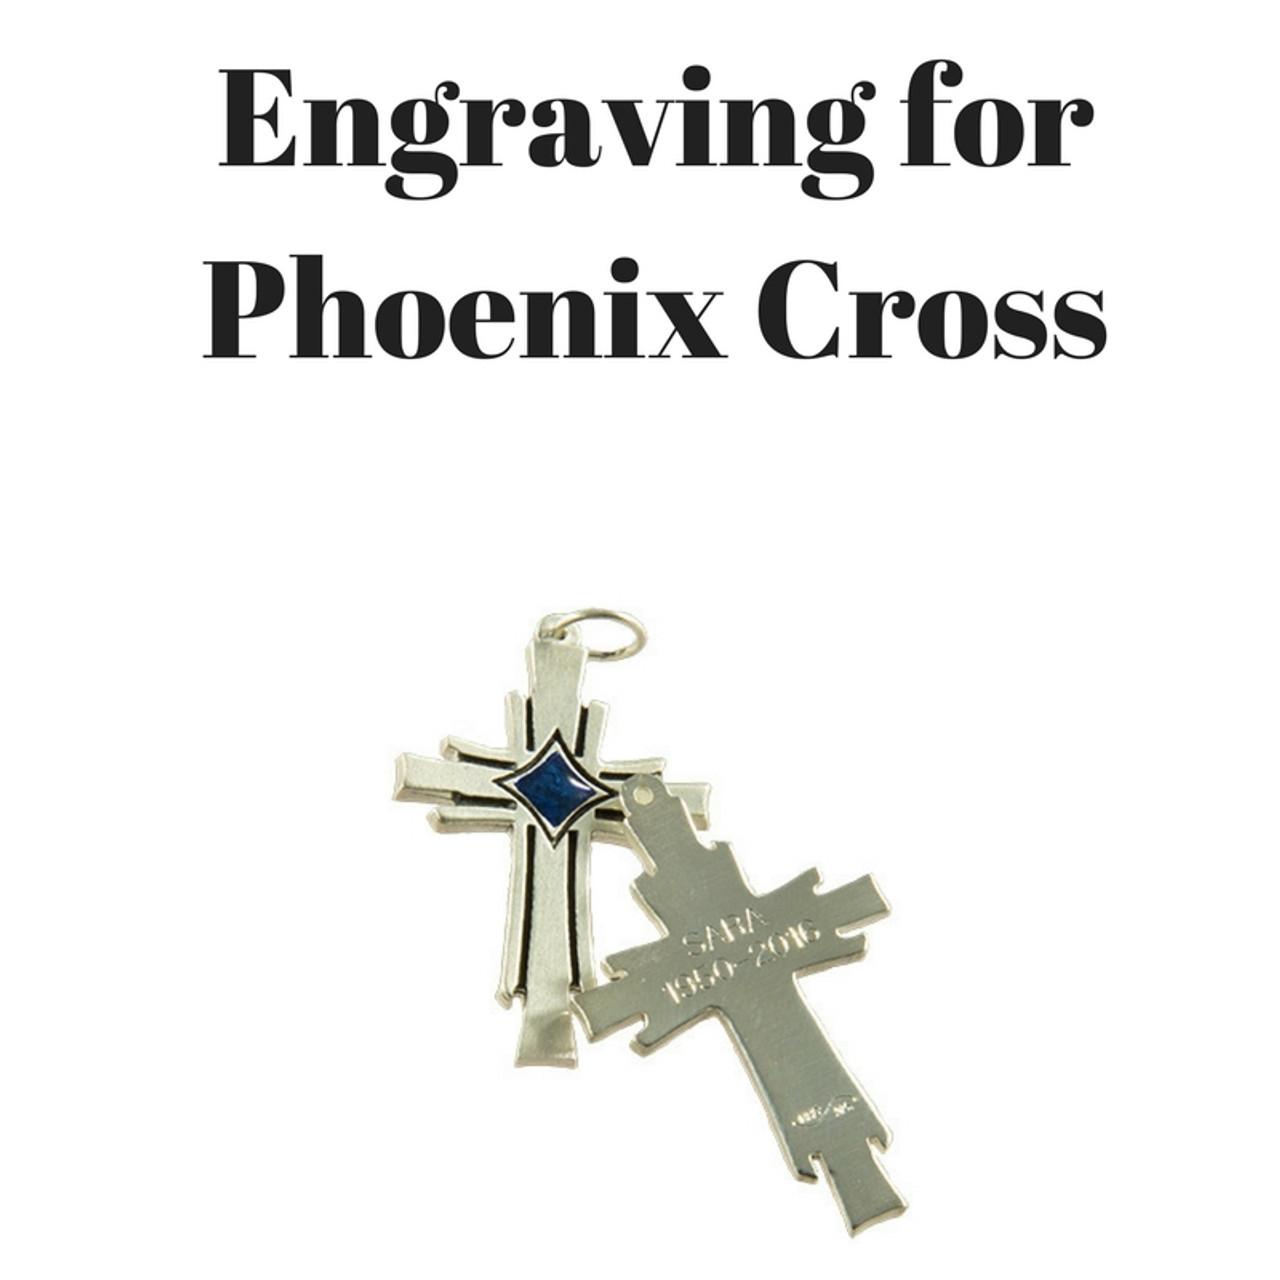 Engraving for Phoenix Cross